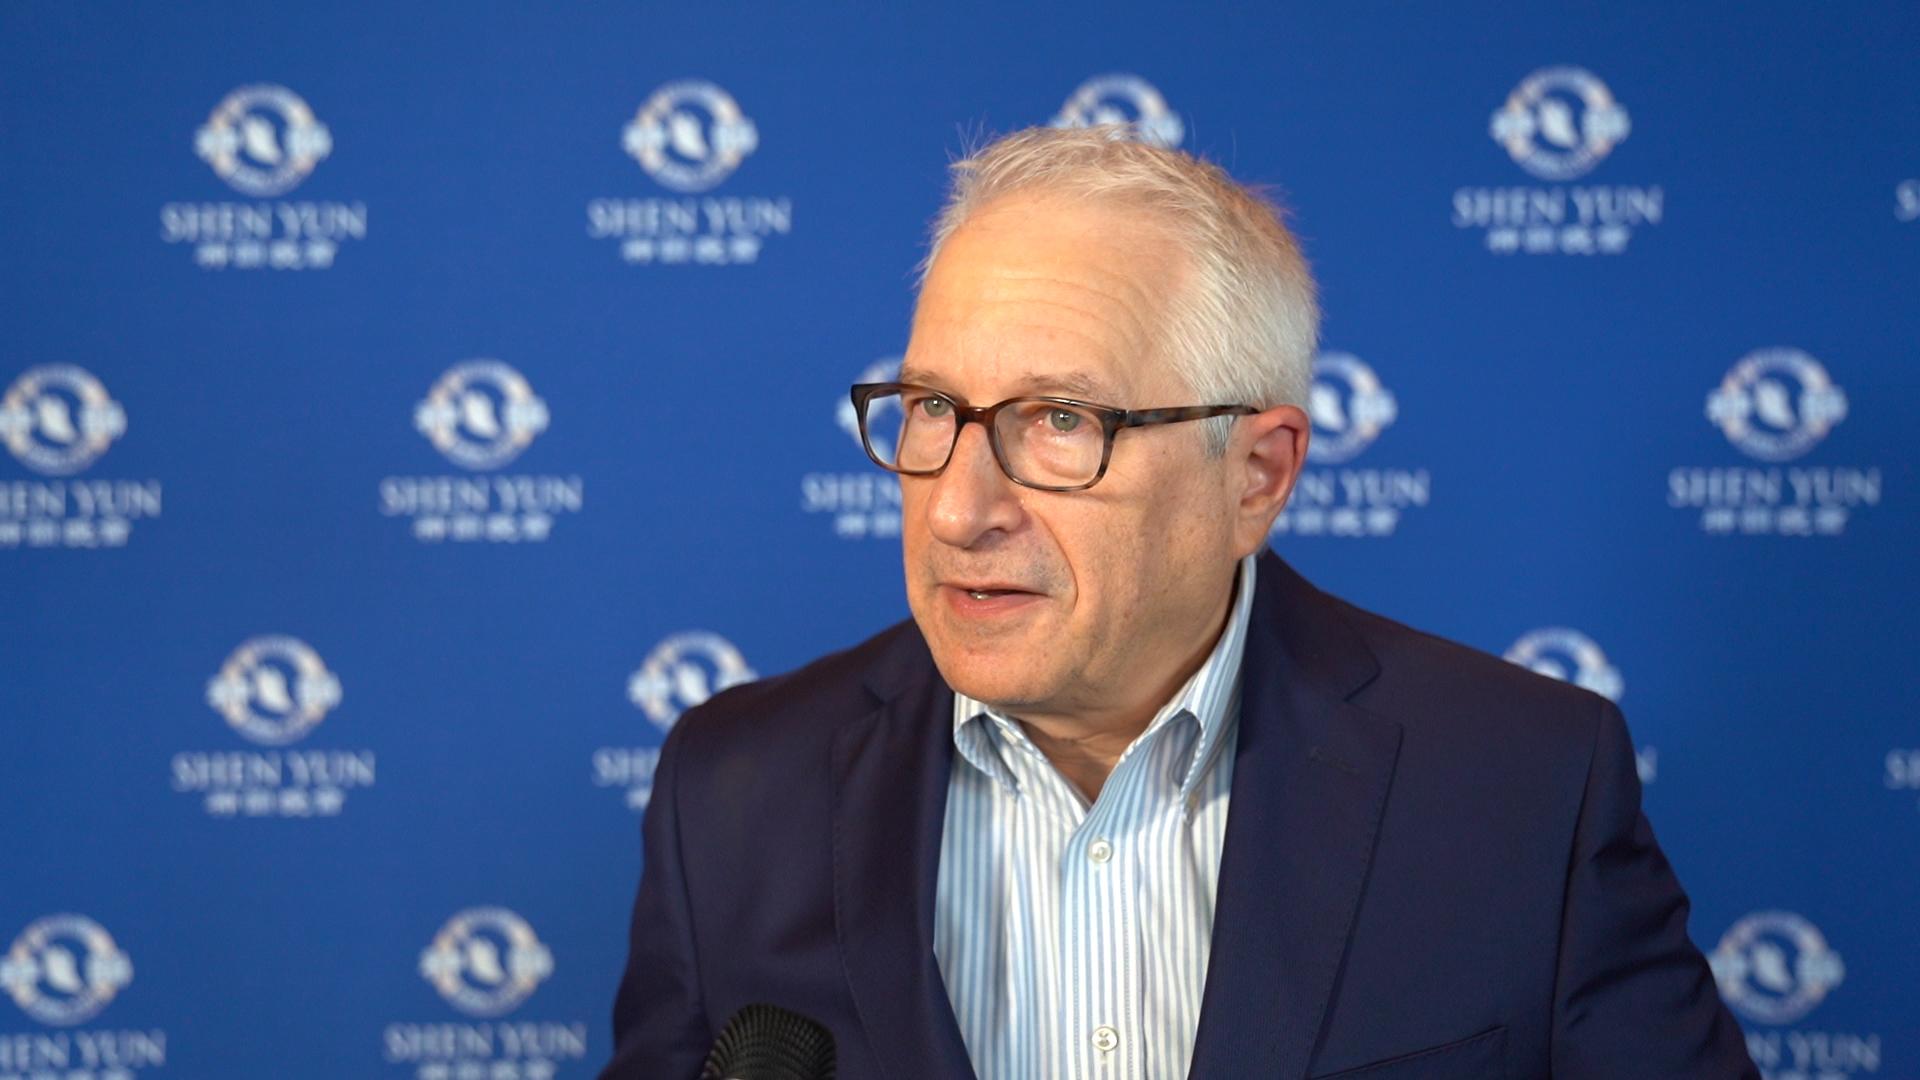 'I Feel the Divinity,' Says Director of Finance of Hyatt Regency Atlanta